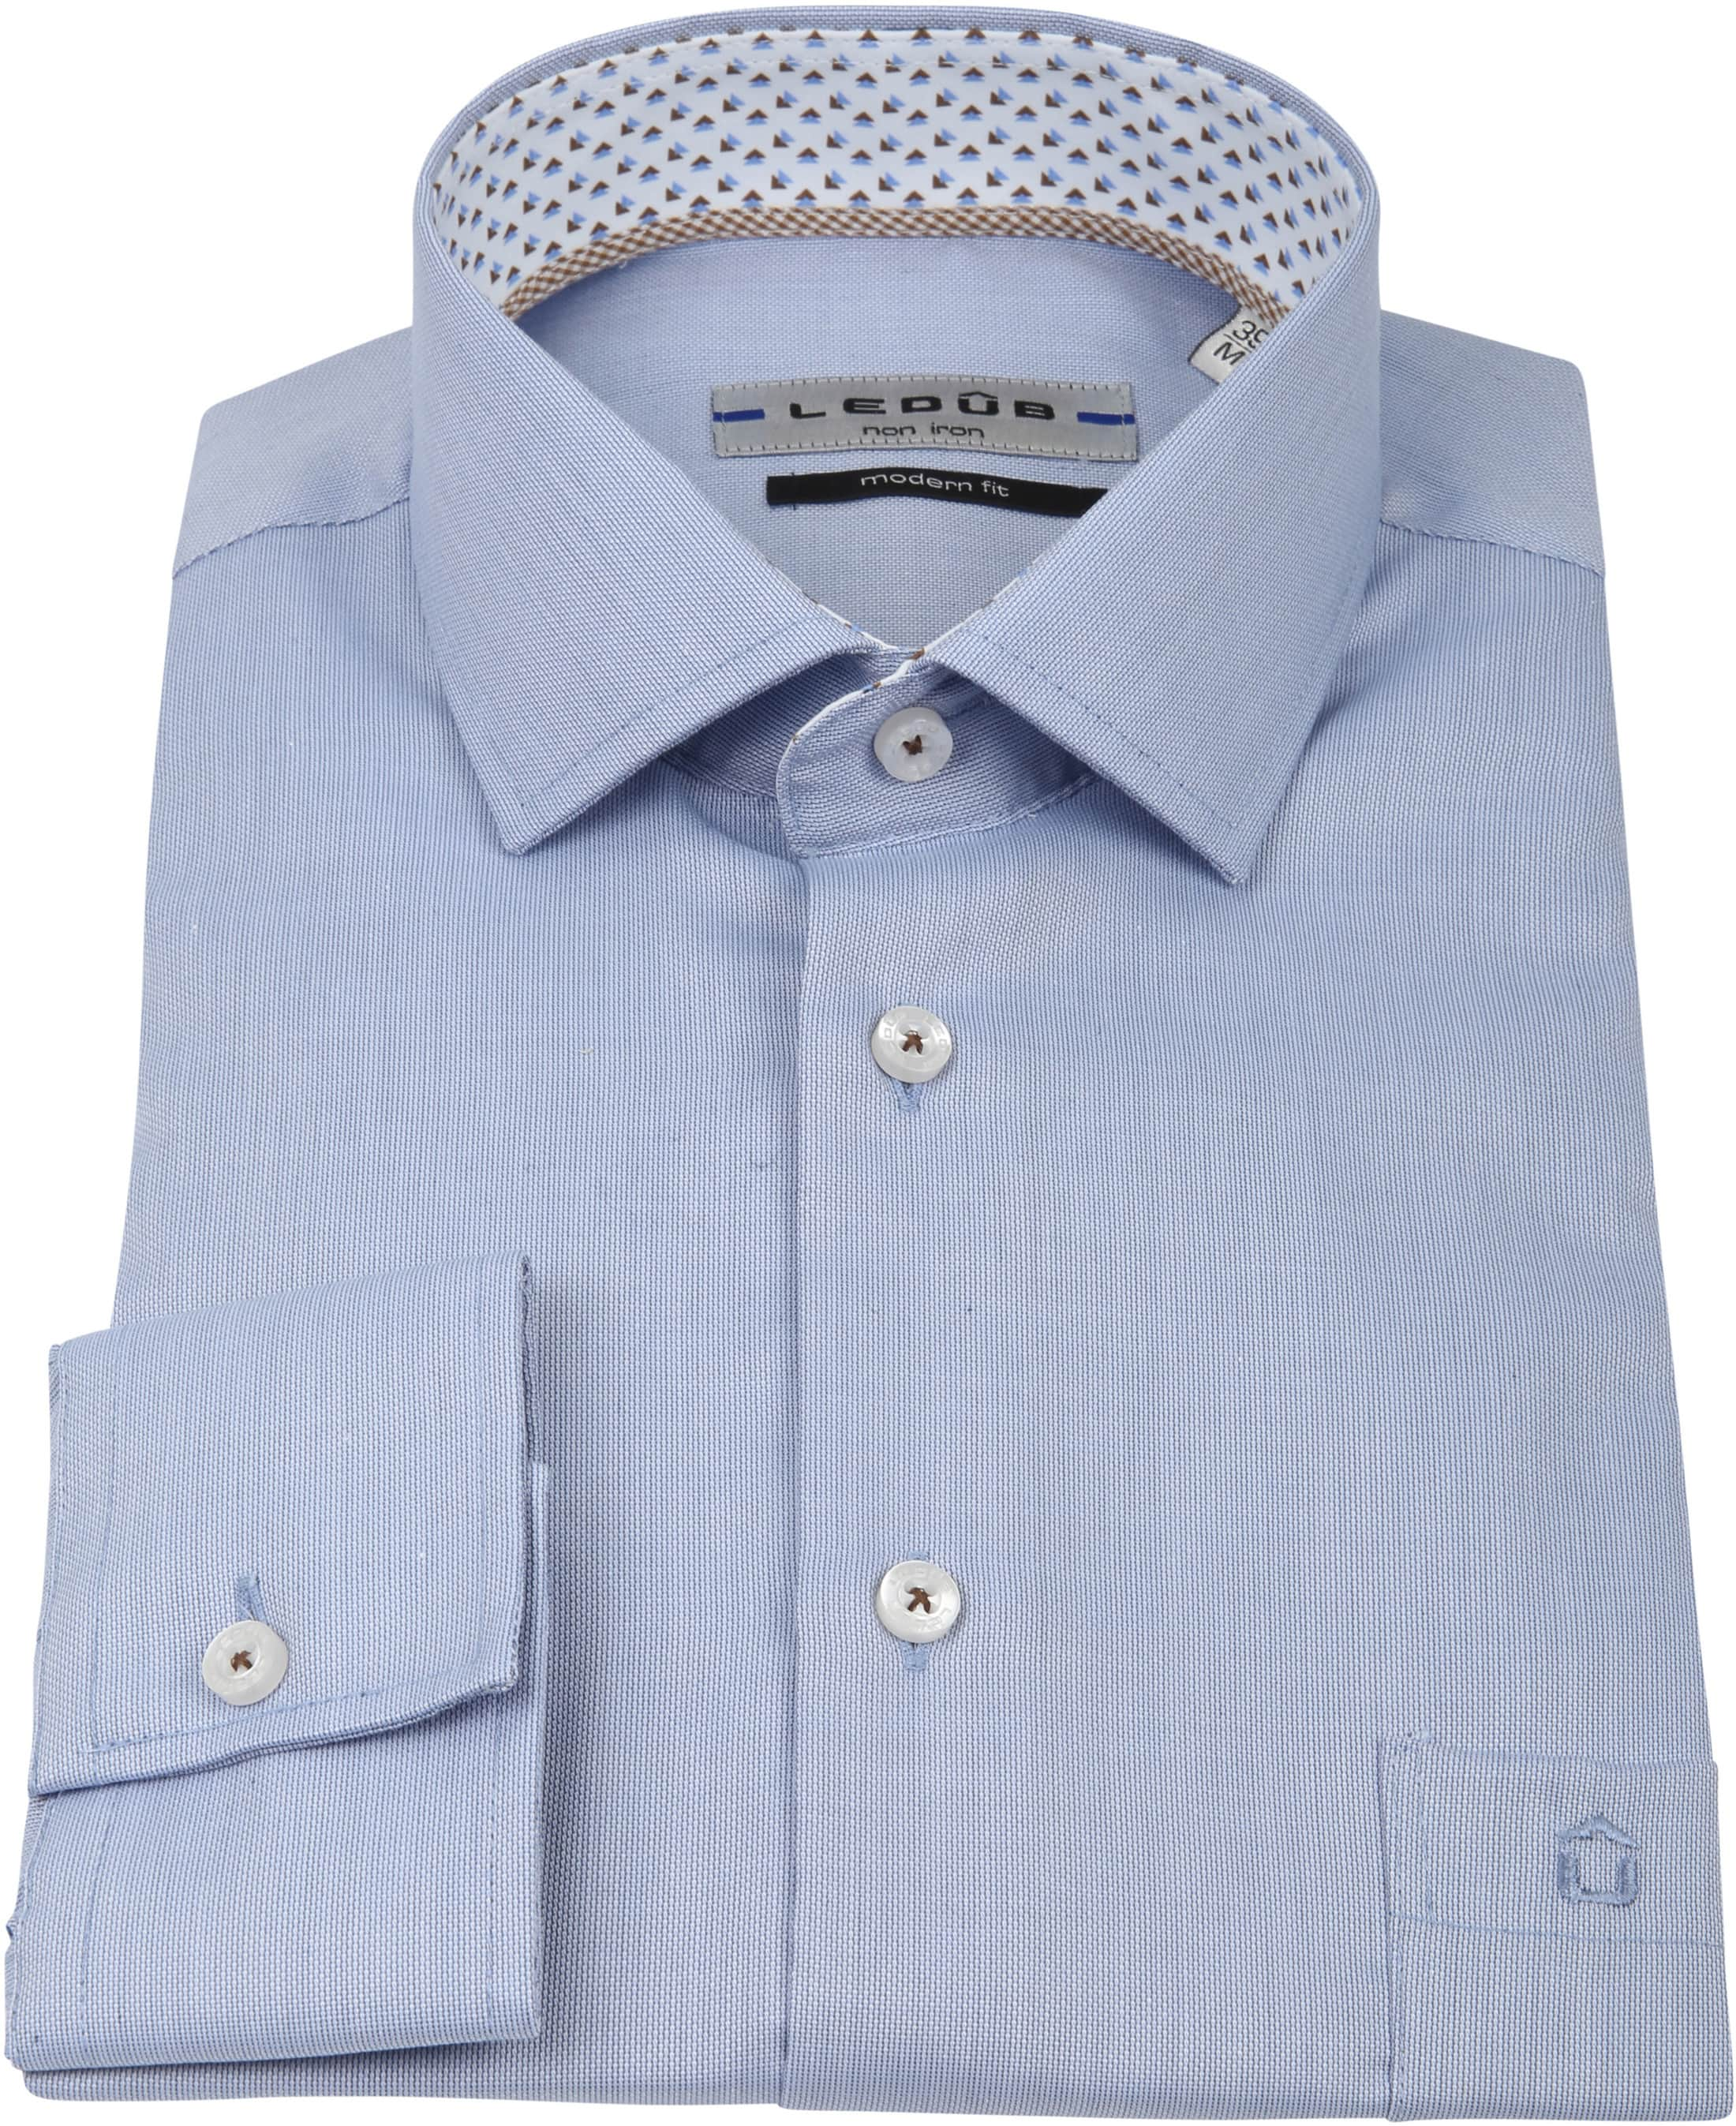 Ledub Overhemd MF Non Iron Blauw foto 3